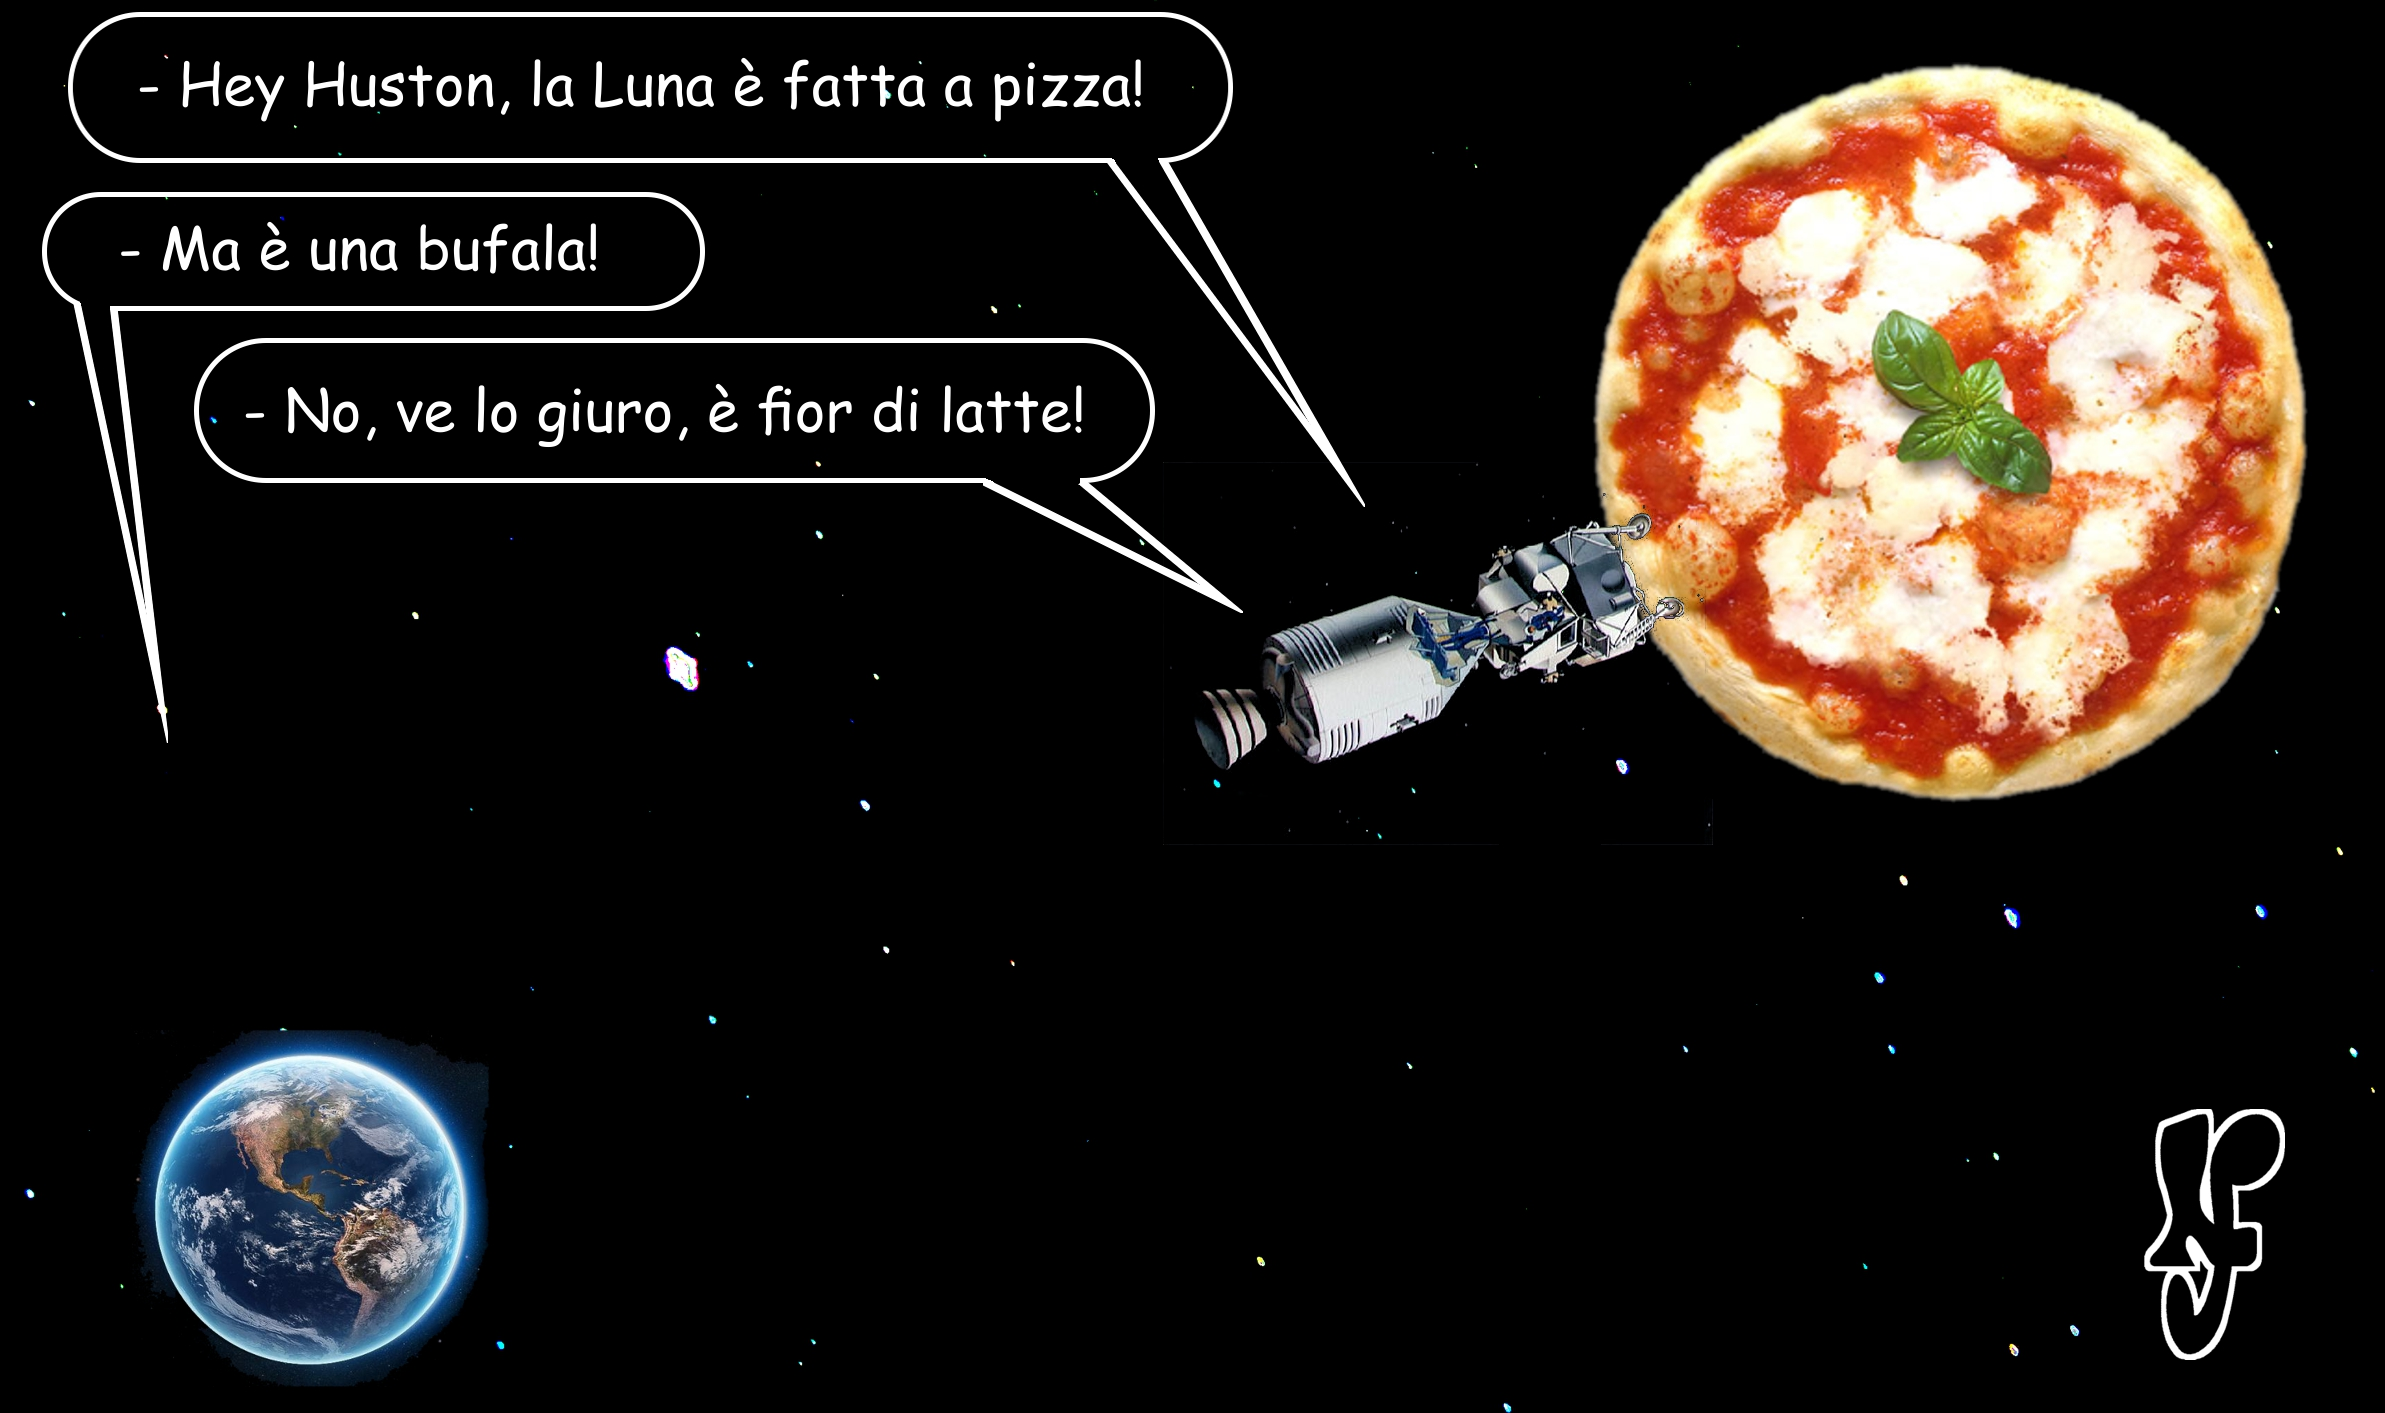 barzelleta luna pizza